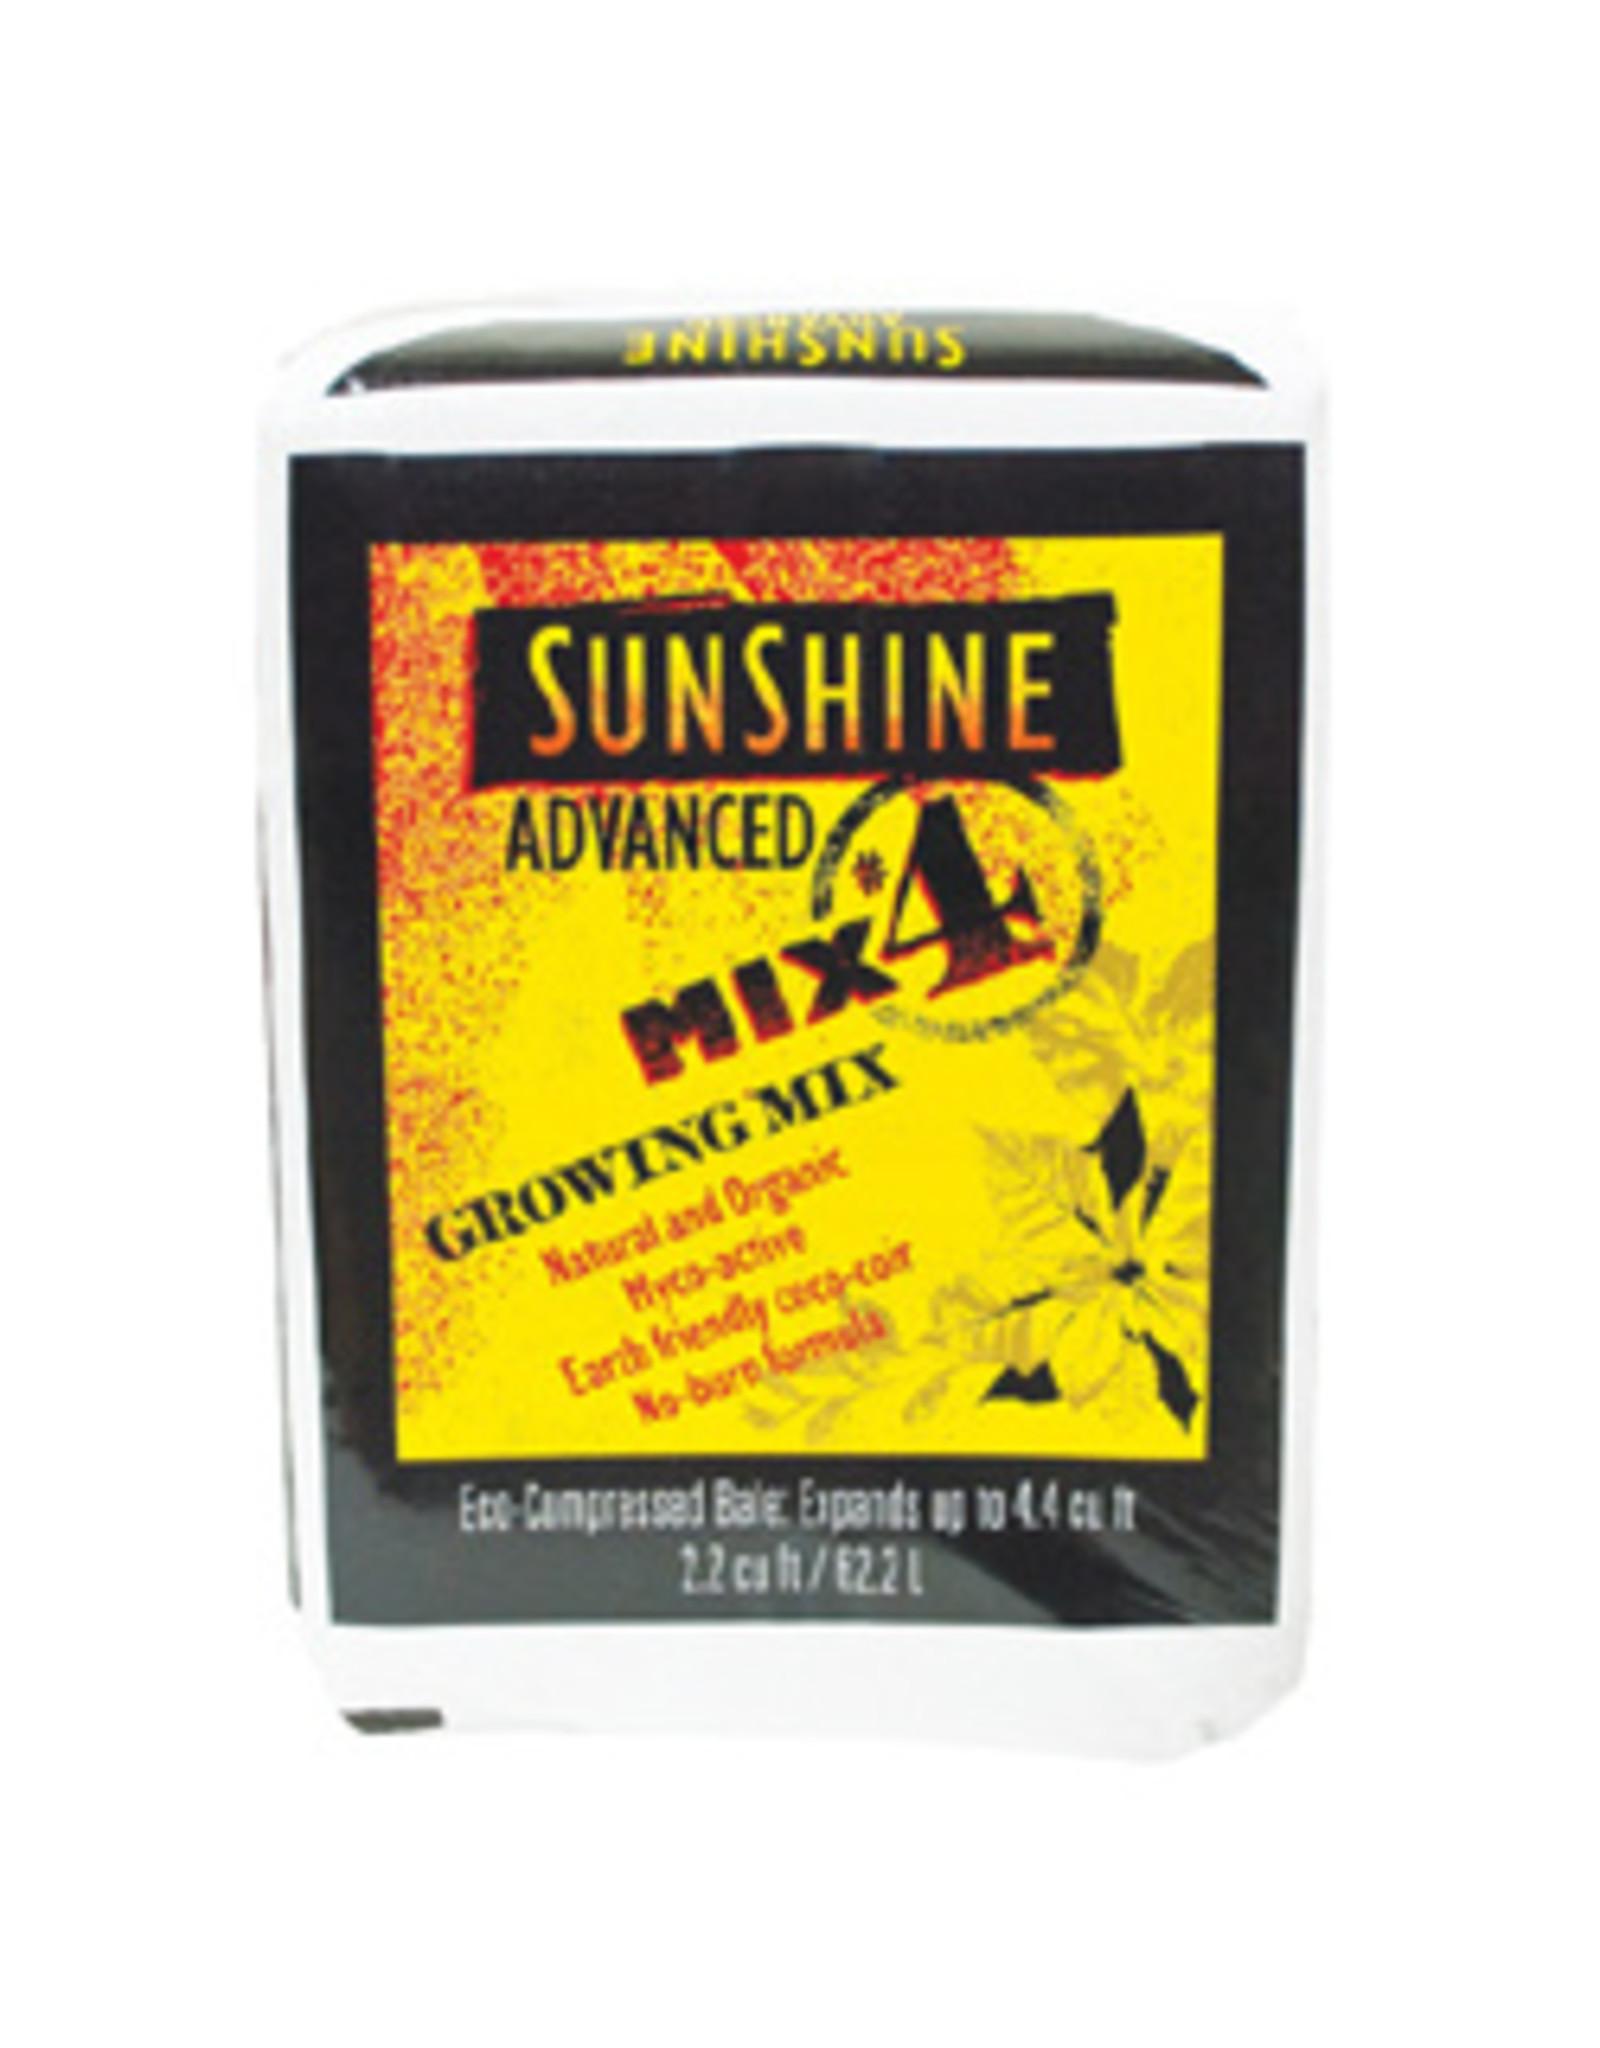 Sunshine Advanced (Yellow Bag) Mix #4 - 3 Cu/Ft